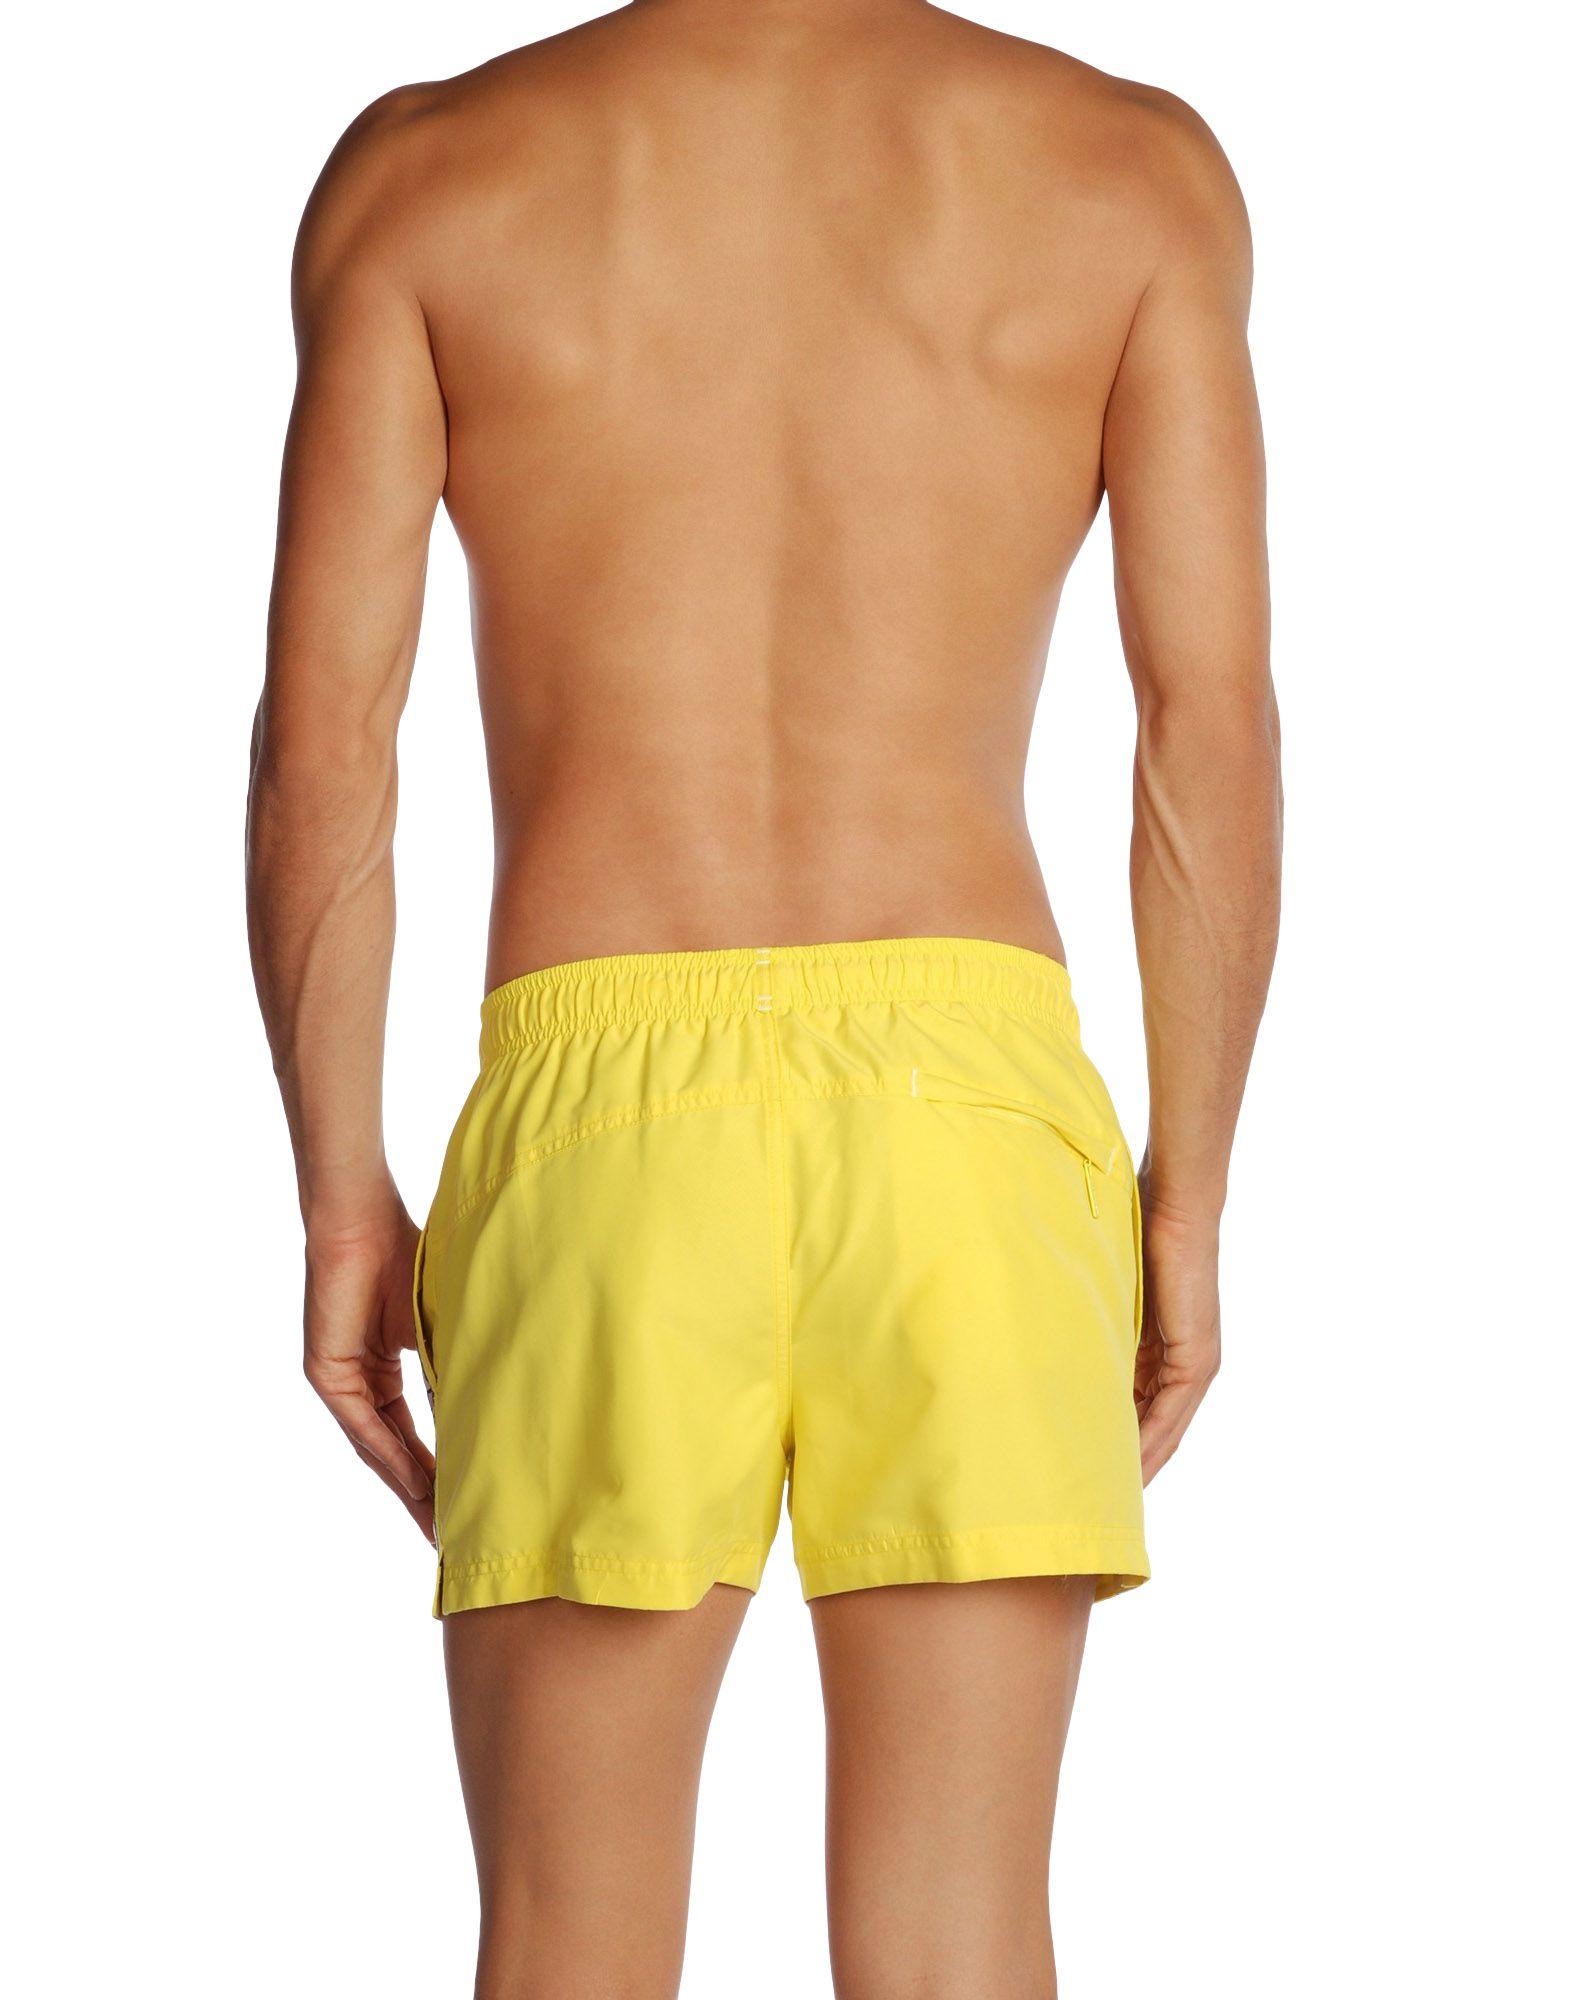 calvin klein yellow swimming trunks for men lyst. Black Bedroom Furniture Sets. Home Design Ideas